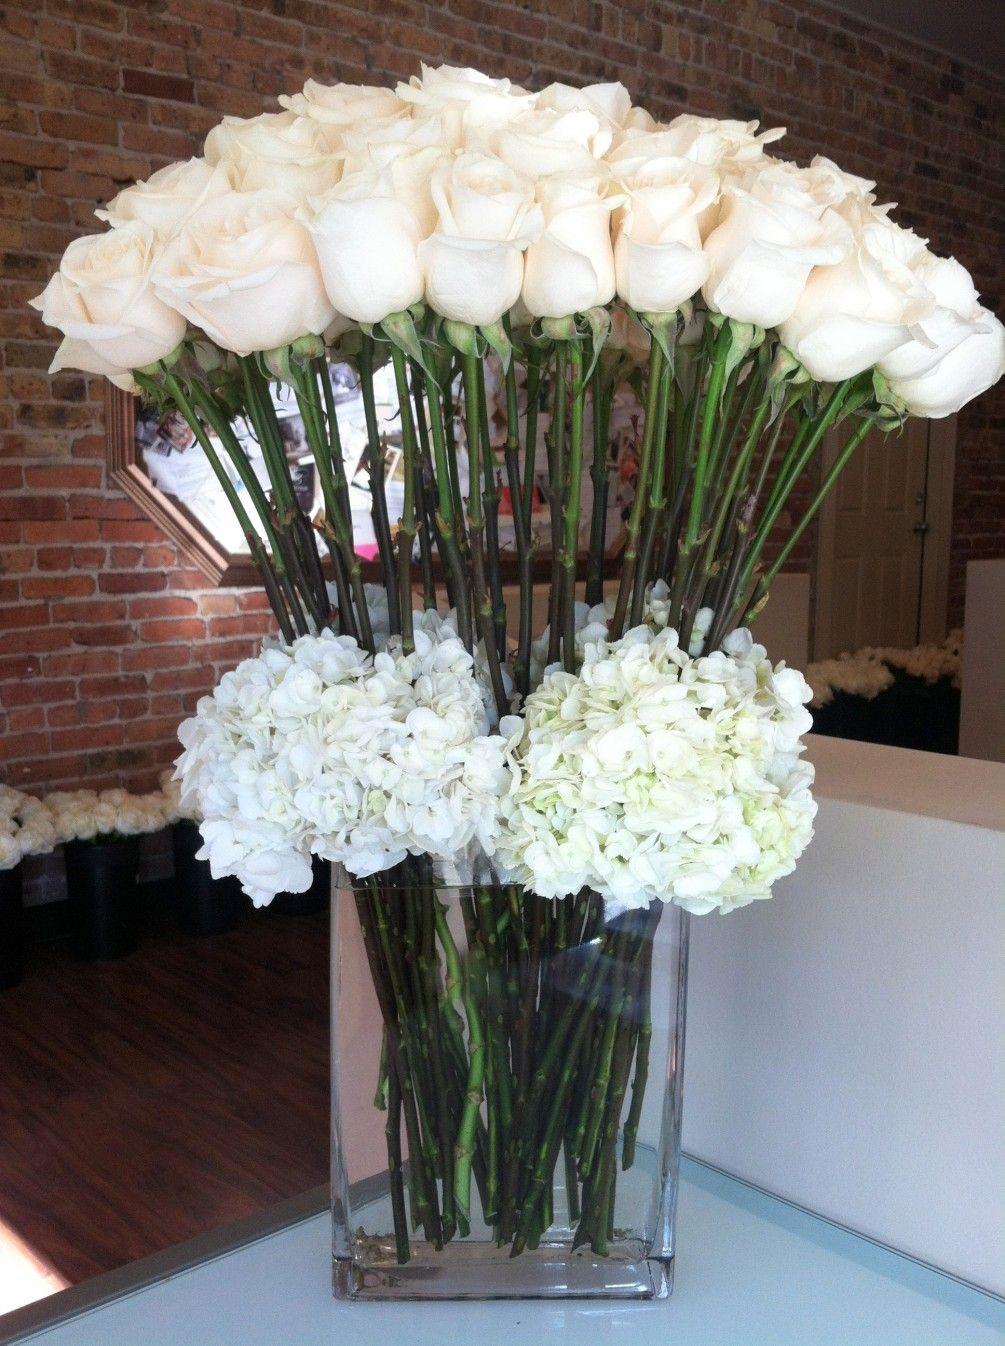 Send Classic Roses And Hydrangea Flowers In Chicago Il Flower Arrangements Unique Flower Arrangements Flower Arrangement Designs